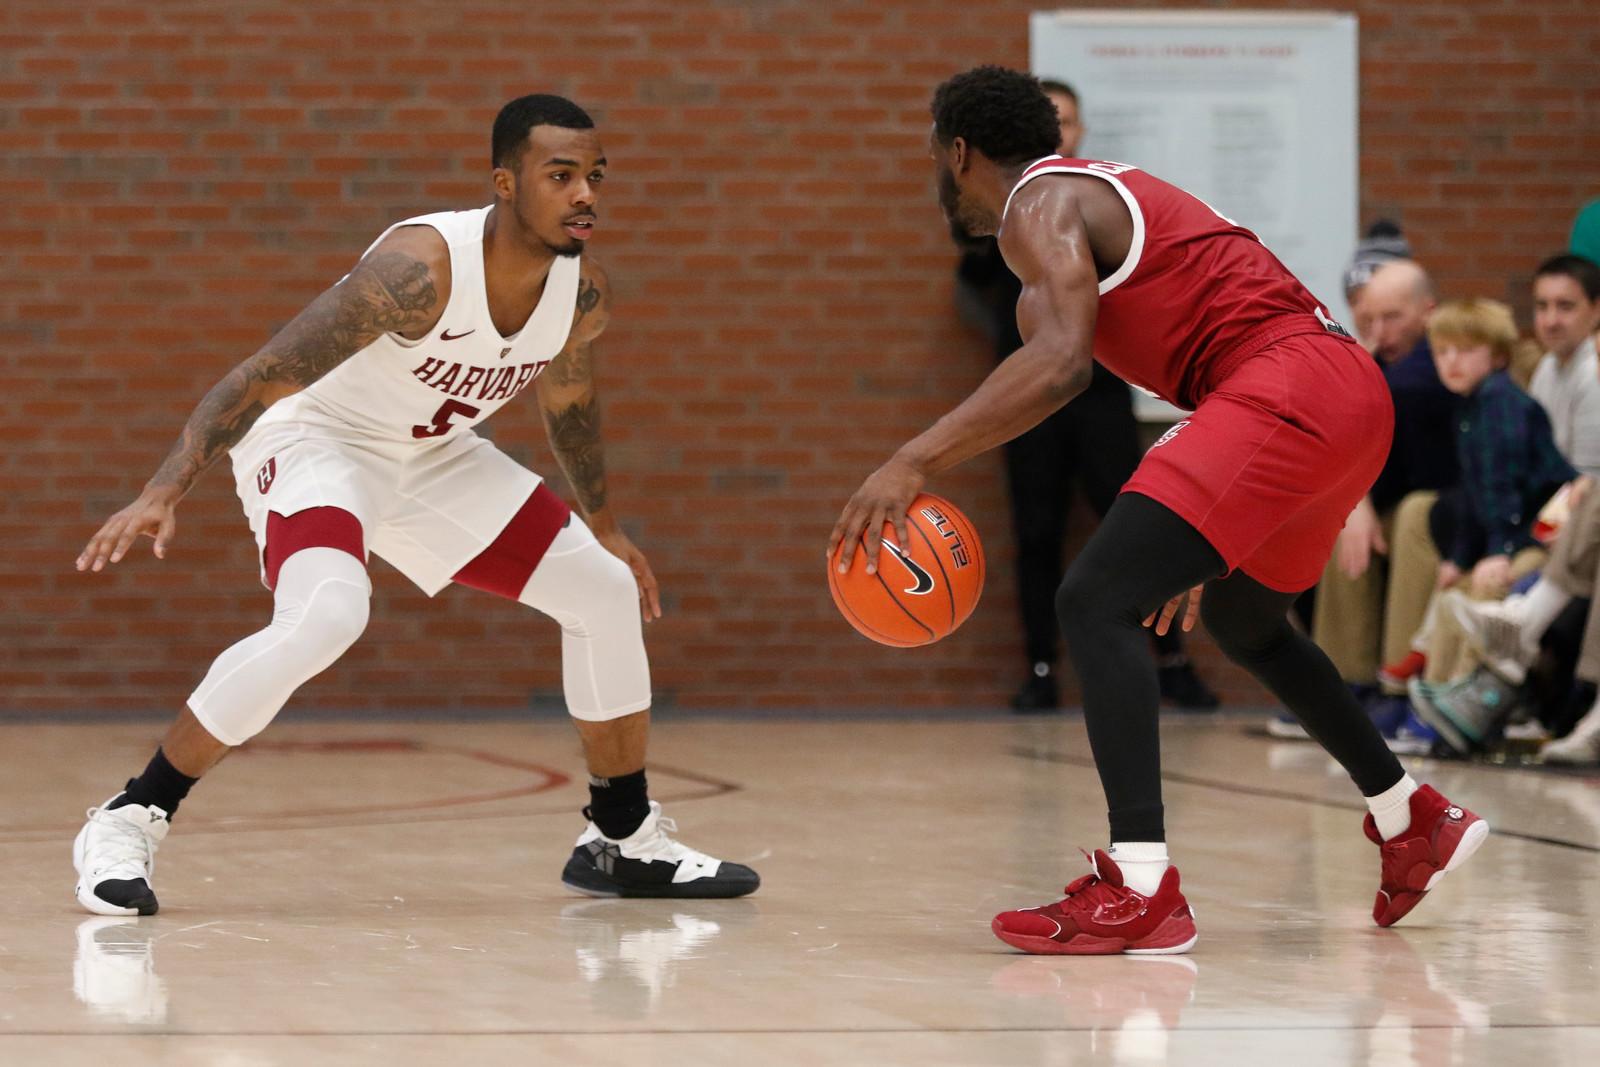 Rio Haskett exhibits his lockdown defense against Massachusetts in a dominant Crimson performance.